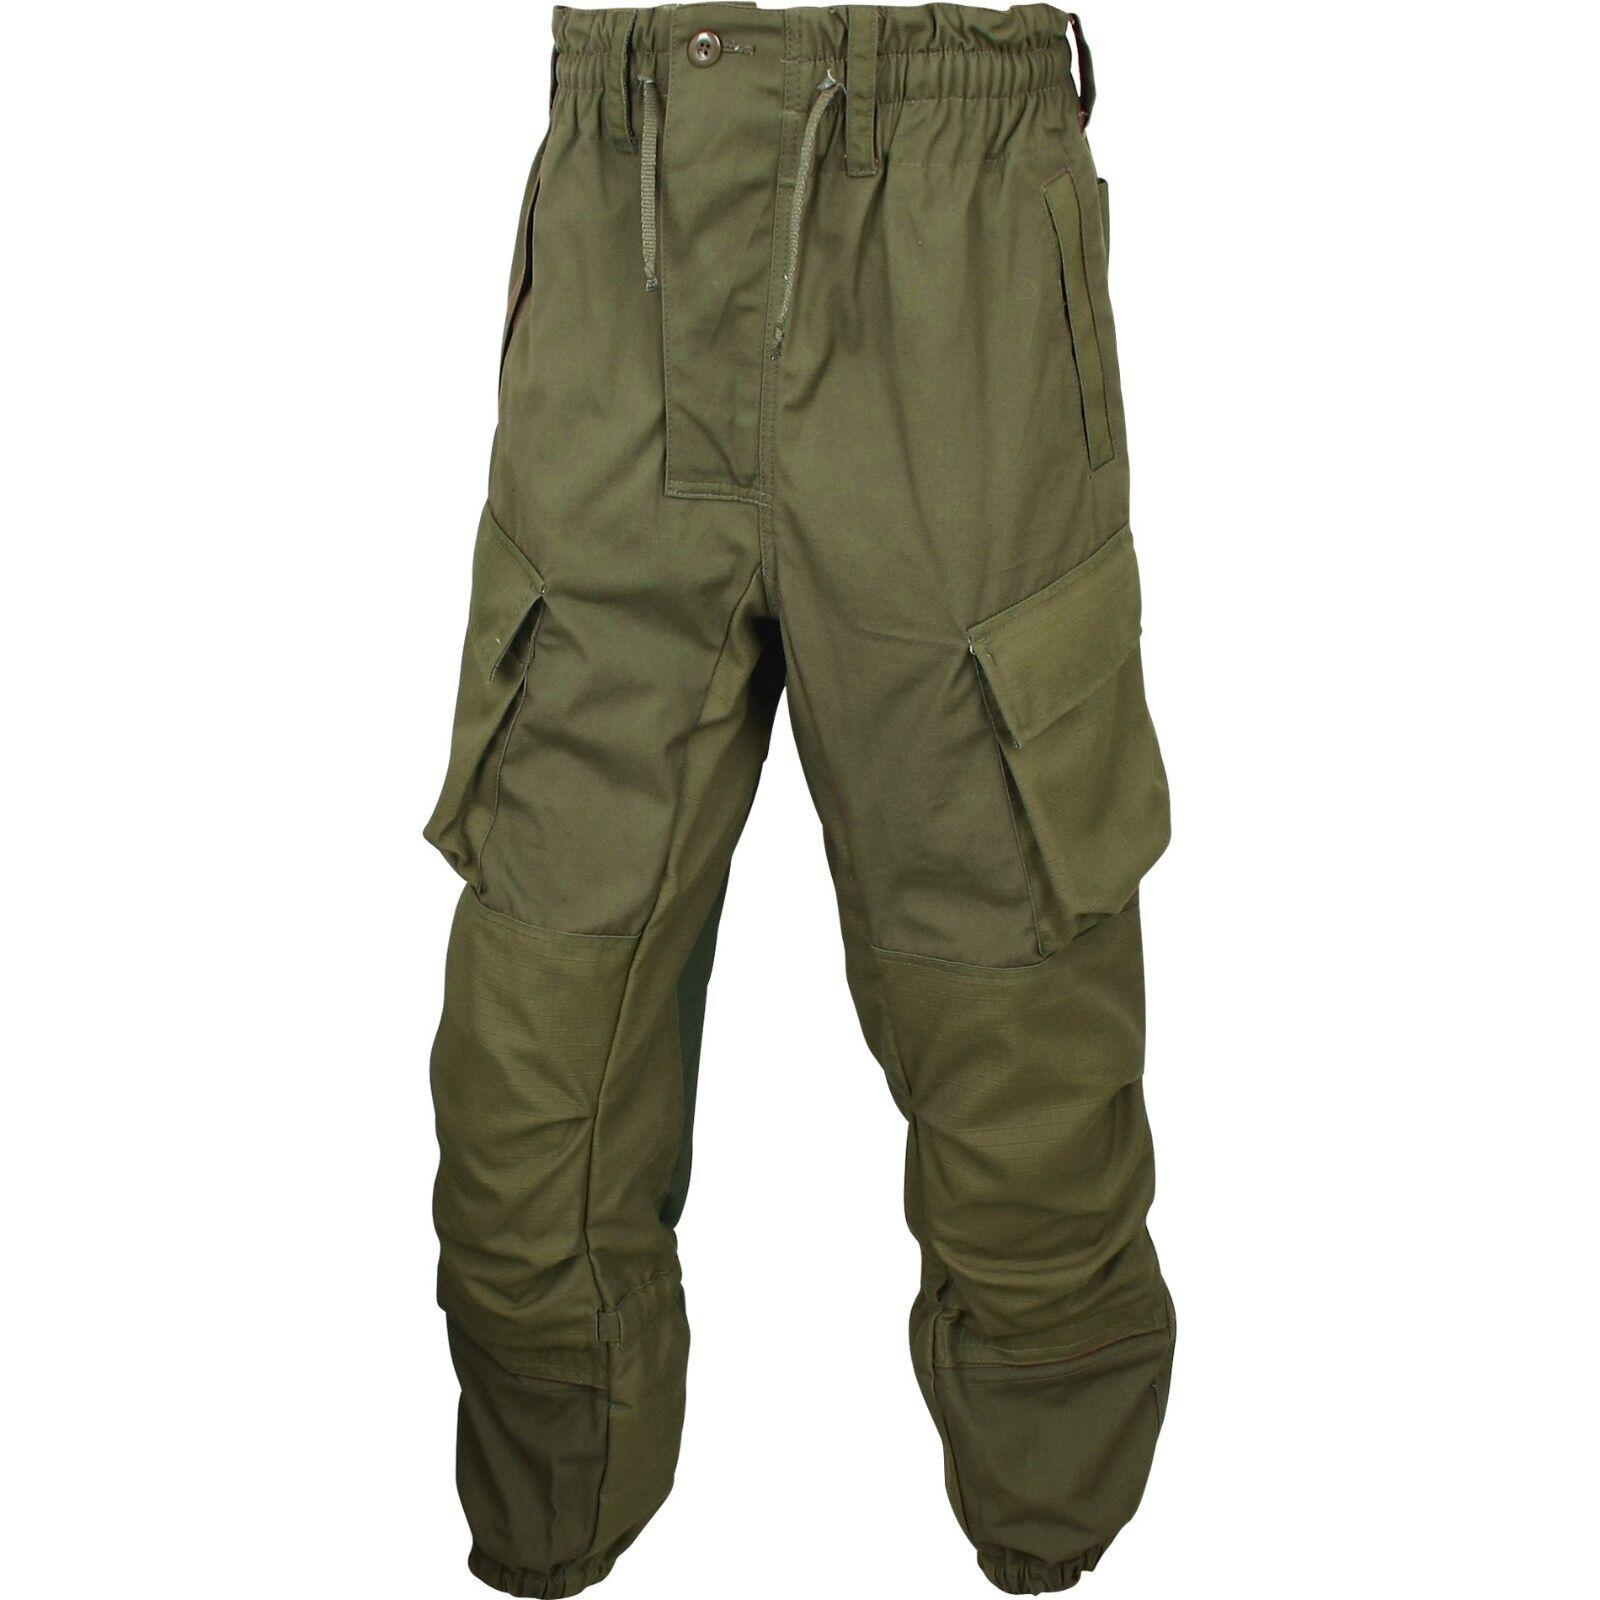 GORKA 3 Russian Spetsnaz Mountain Pants ORIGINAL